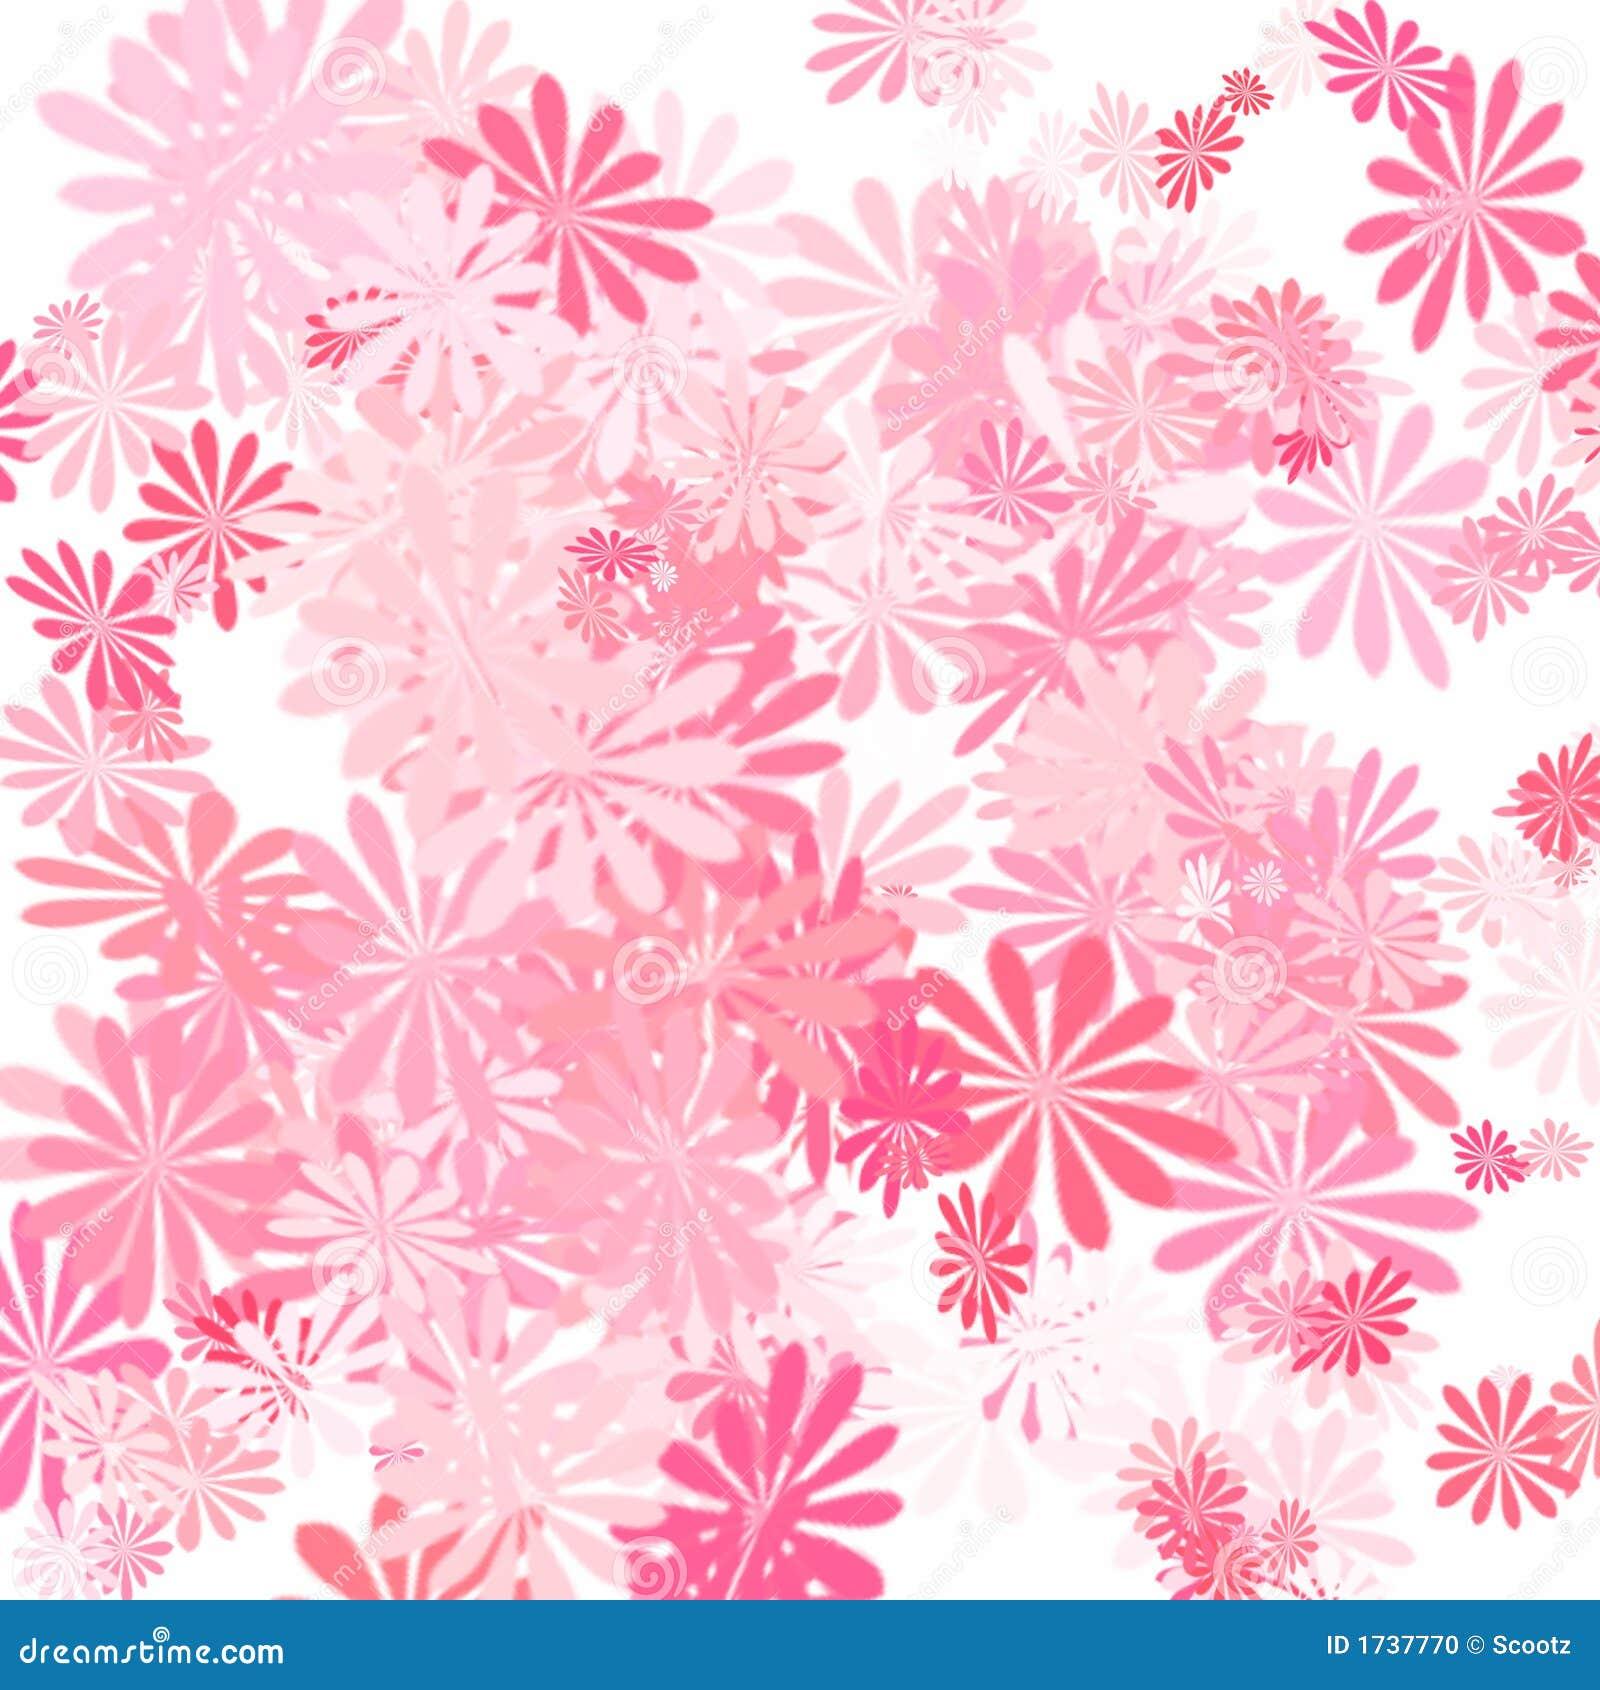 Pink flower art stock illustration illustration of layered 1737770 pink flower art mightylinksfo